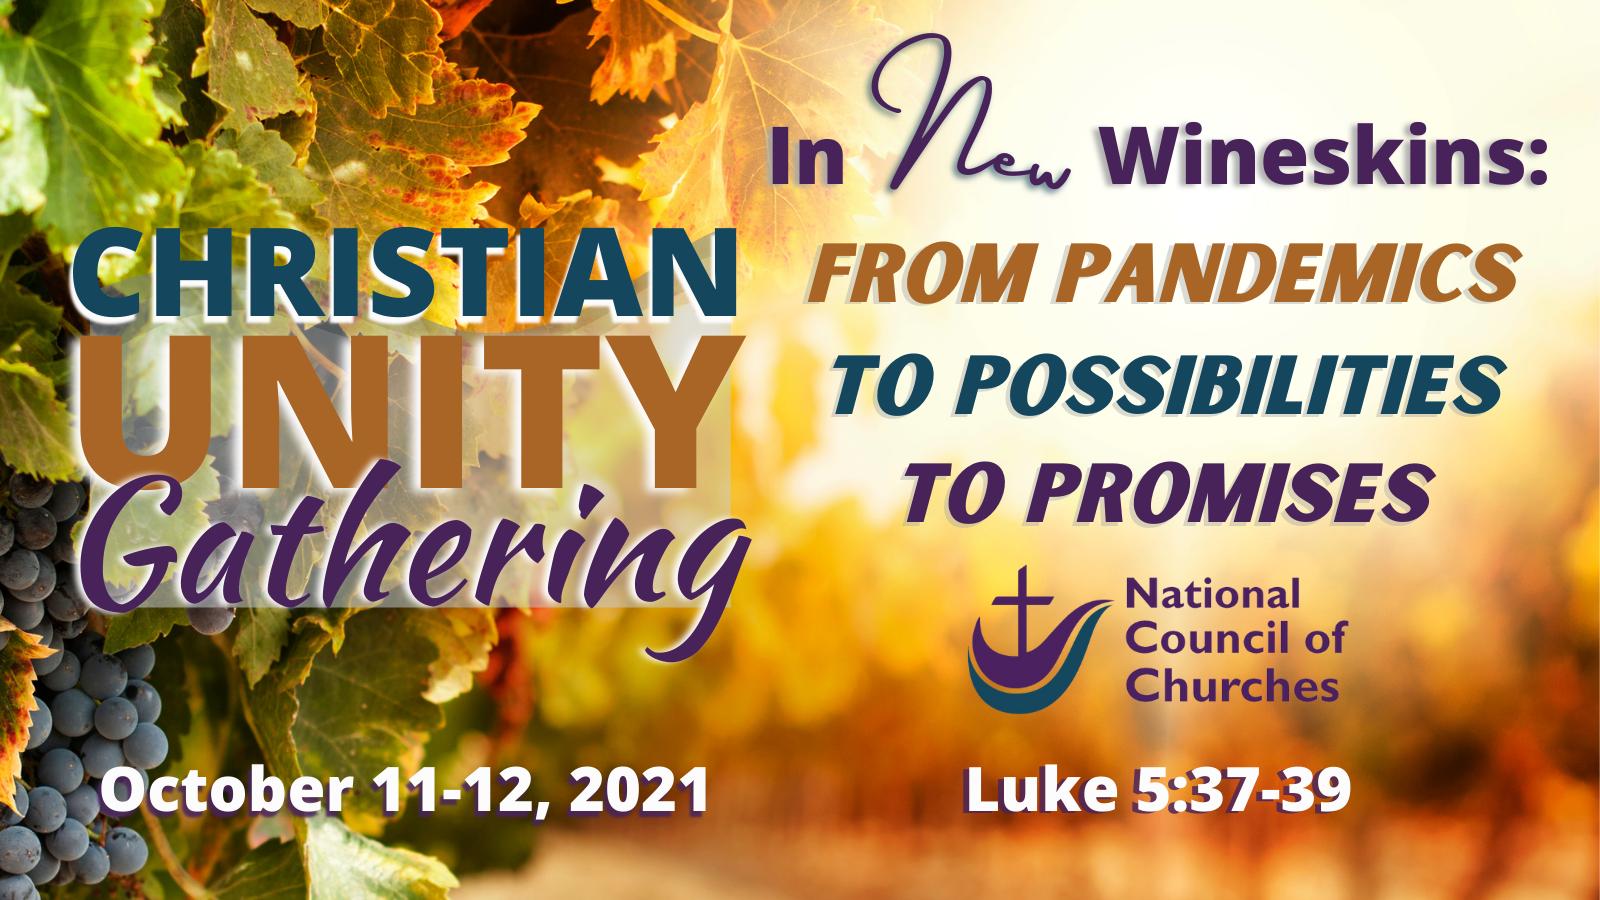 Christian Unity Gathering flyer